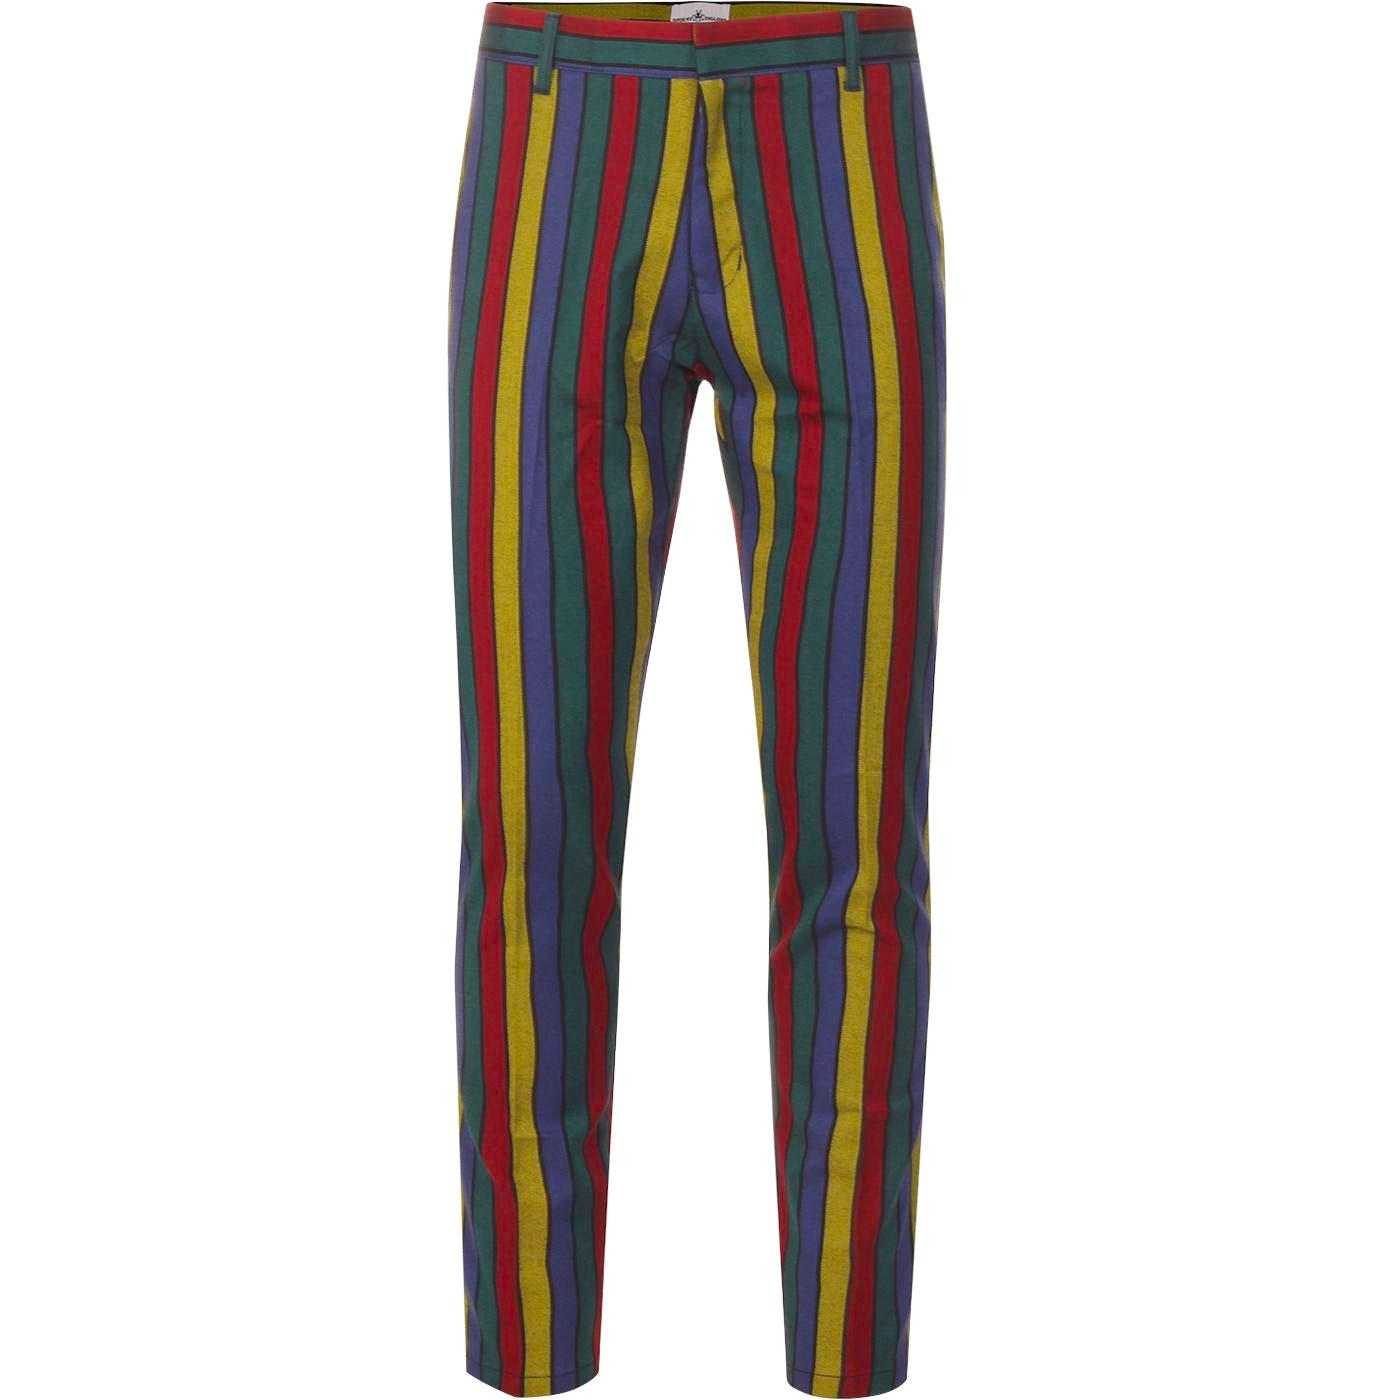 Madcap England Hendrix Stripe Retro 60s Psychedelic Slim Trousers